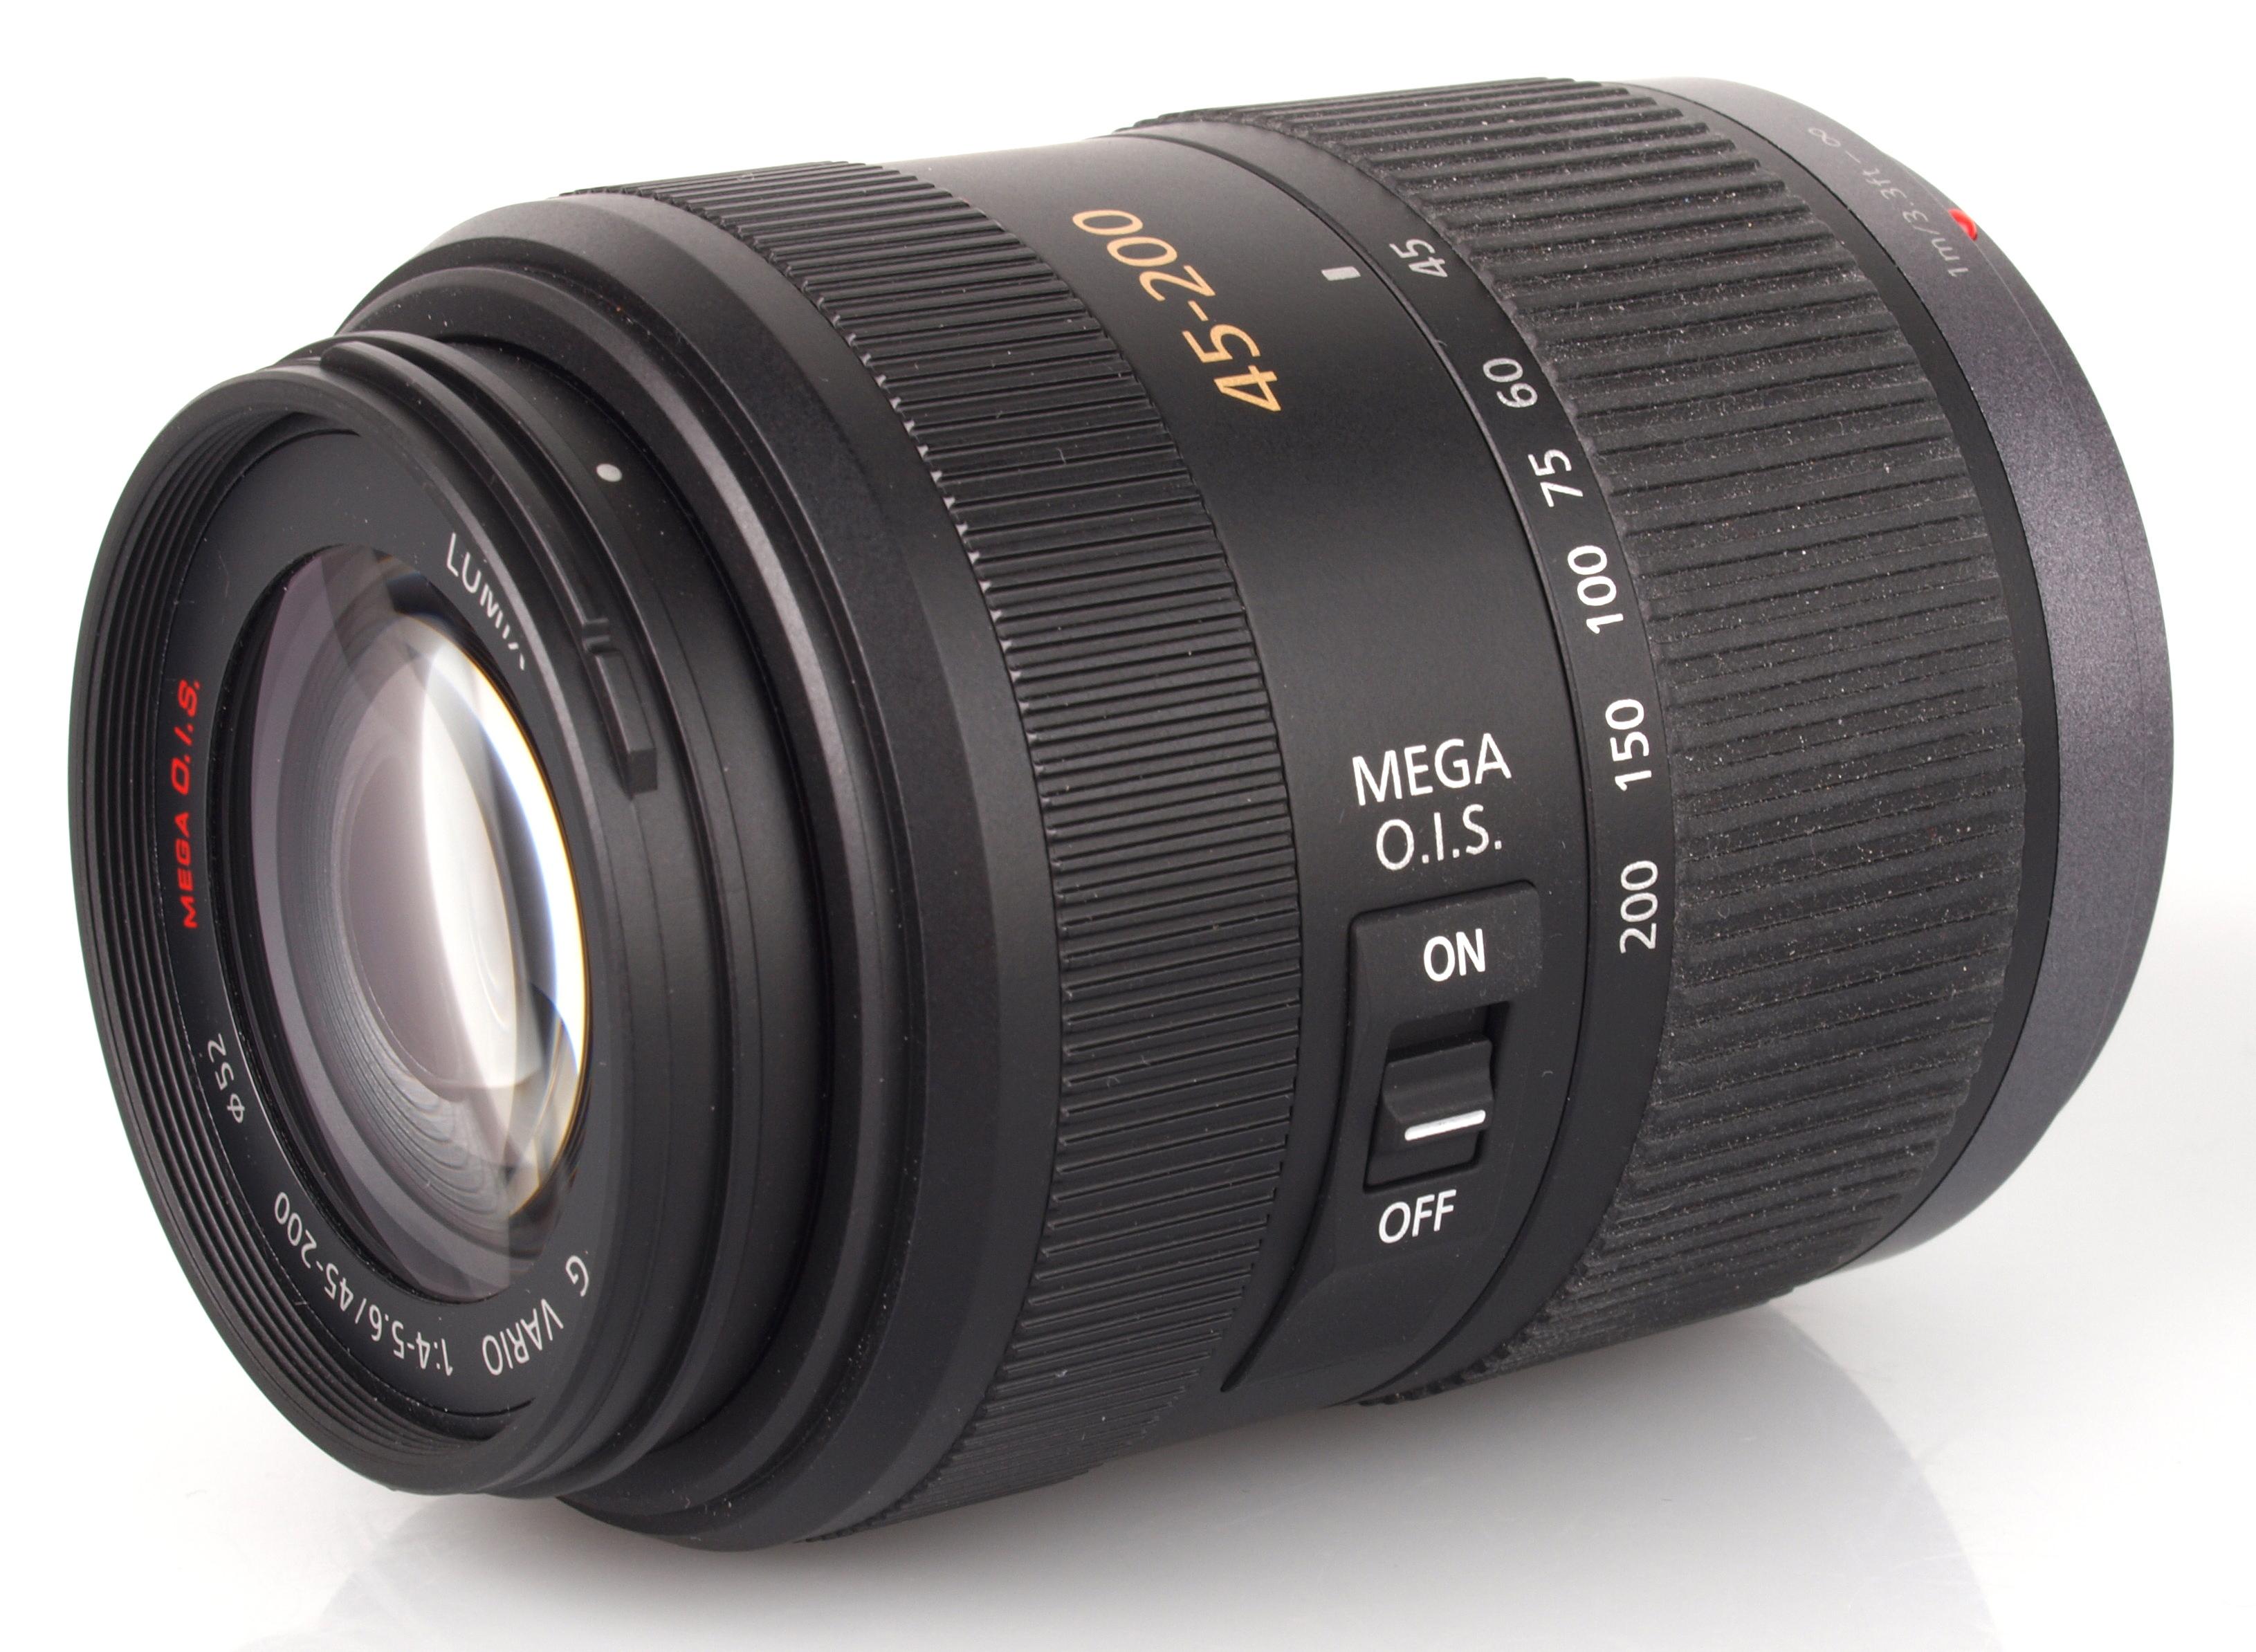 panasonic lumix g vario 45 200mm f 4 0 5 6 lens review rh ephotozine com Lumix G9 lumix g3 user guide